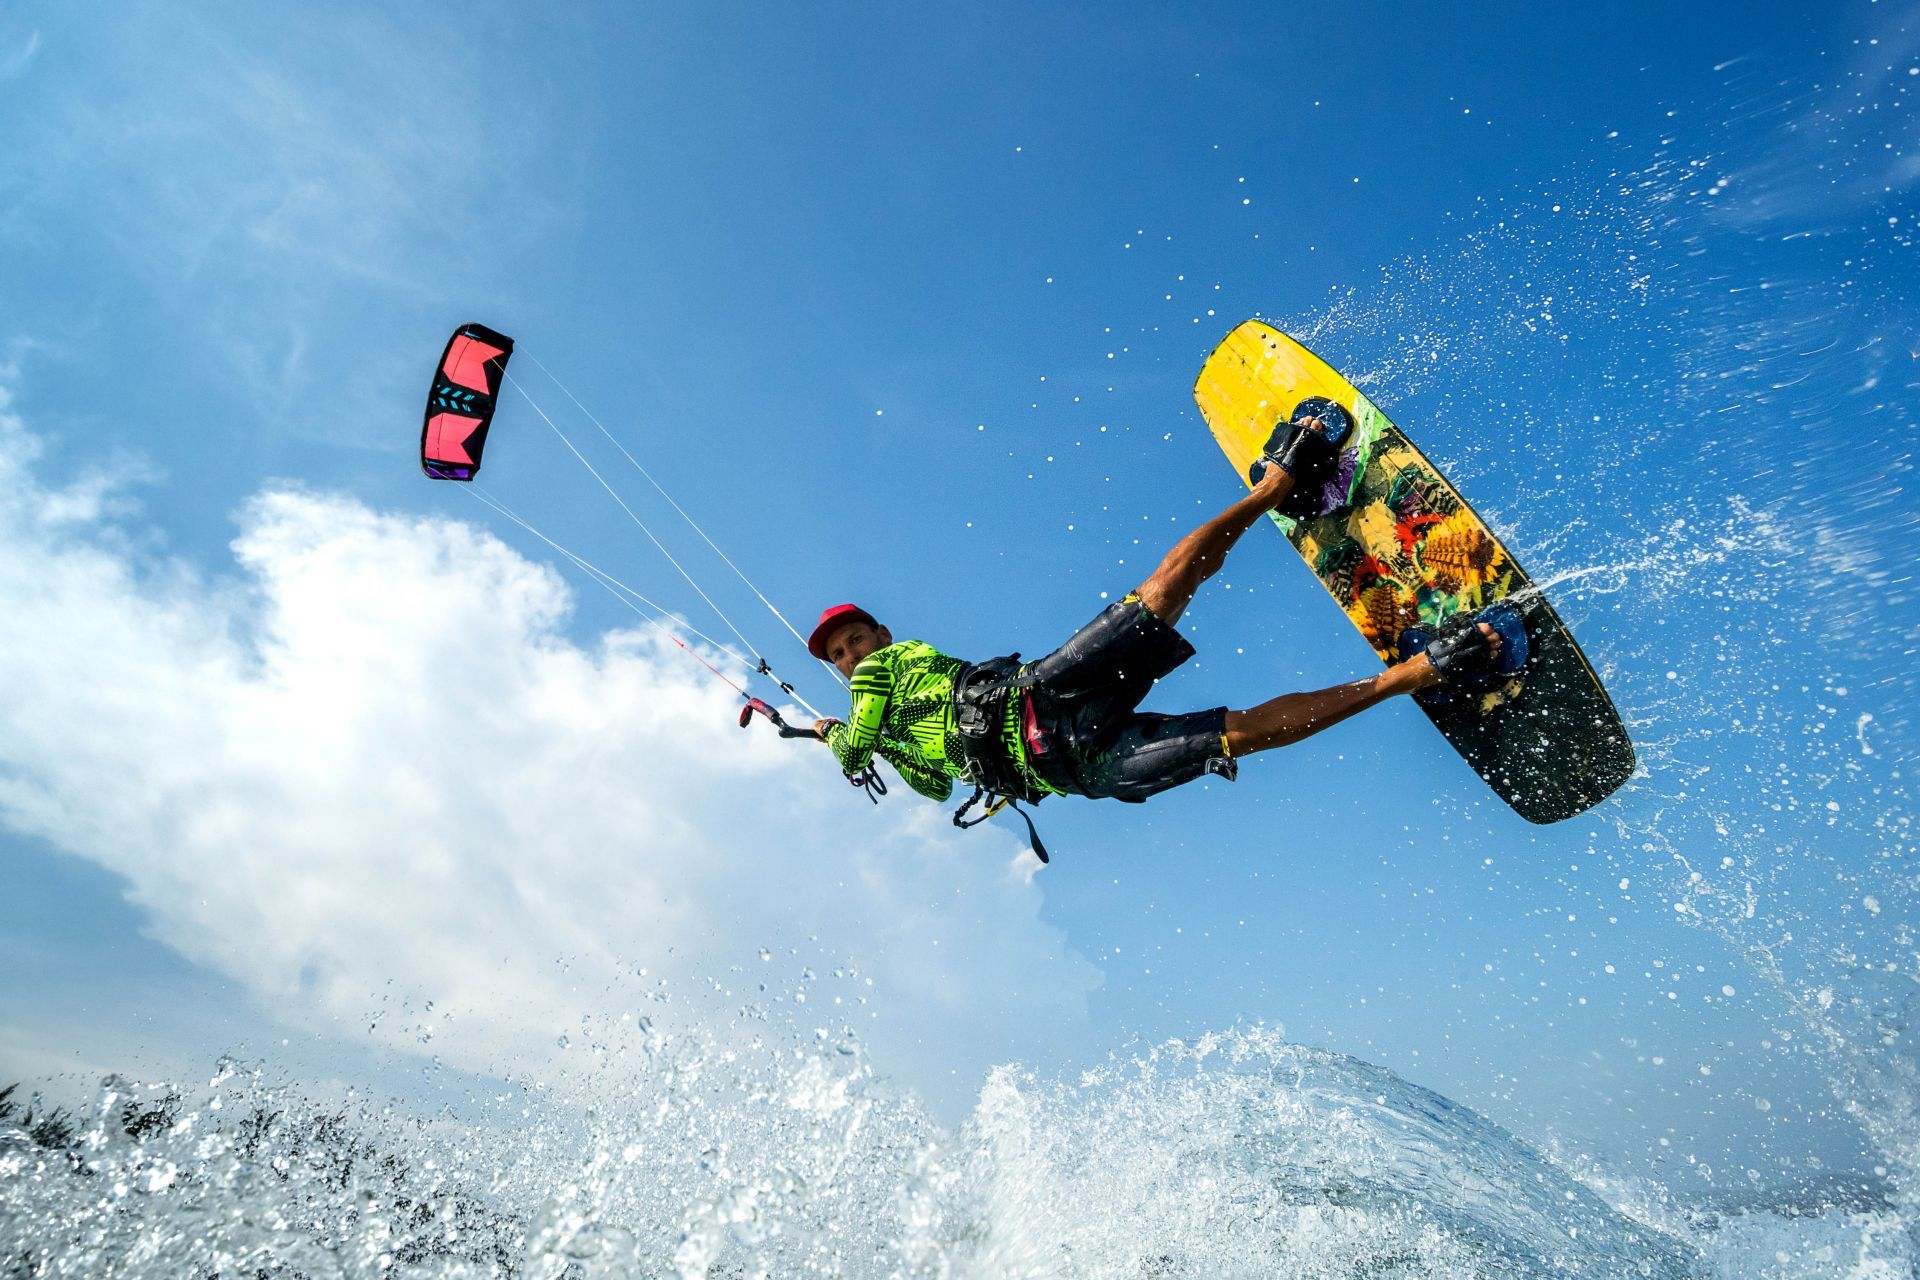 greece sports kitesurfing 1 1920